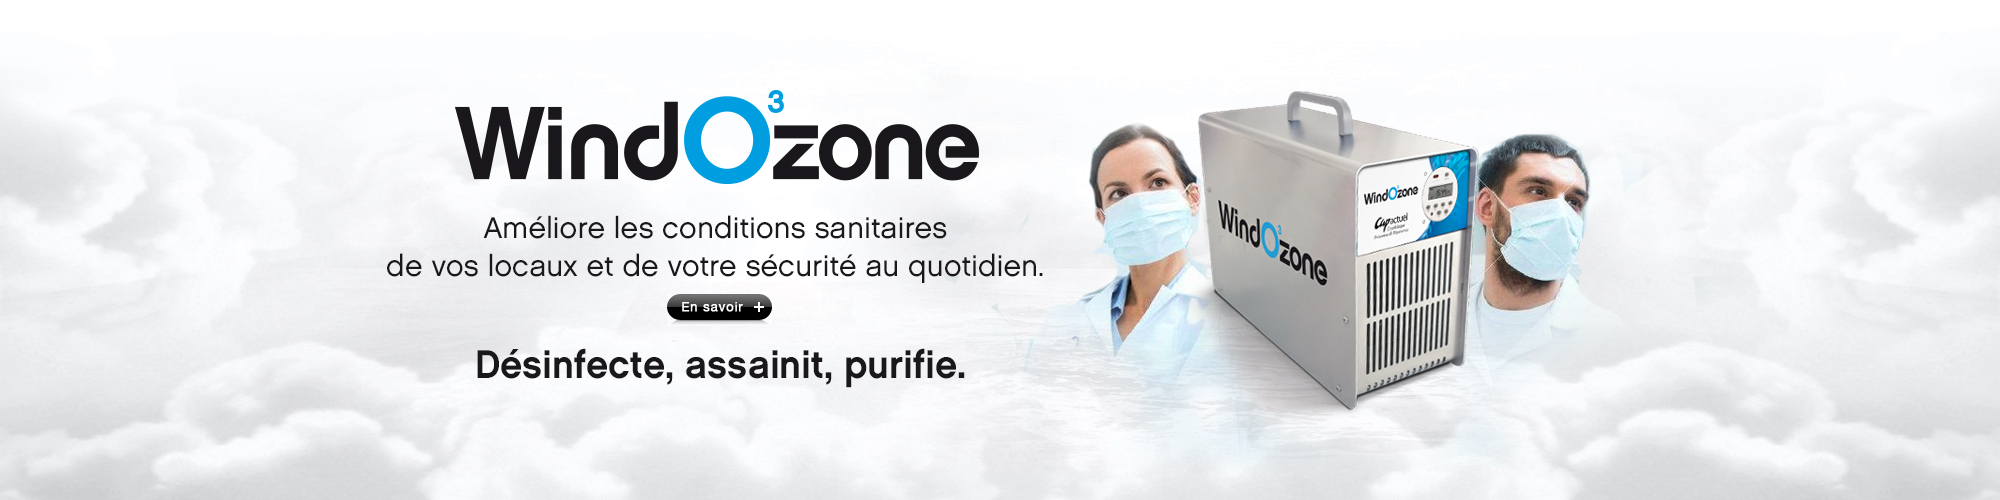 https://www.capactuel.com/storage/app/media/Accueil/bannierewindozone2.jpg